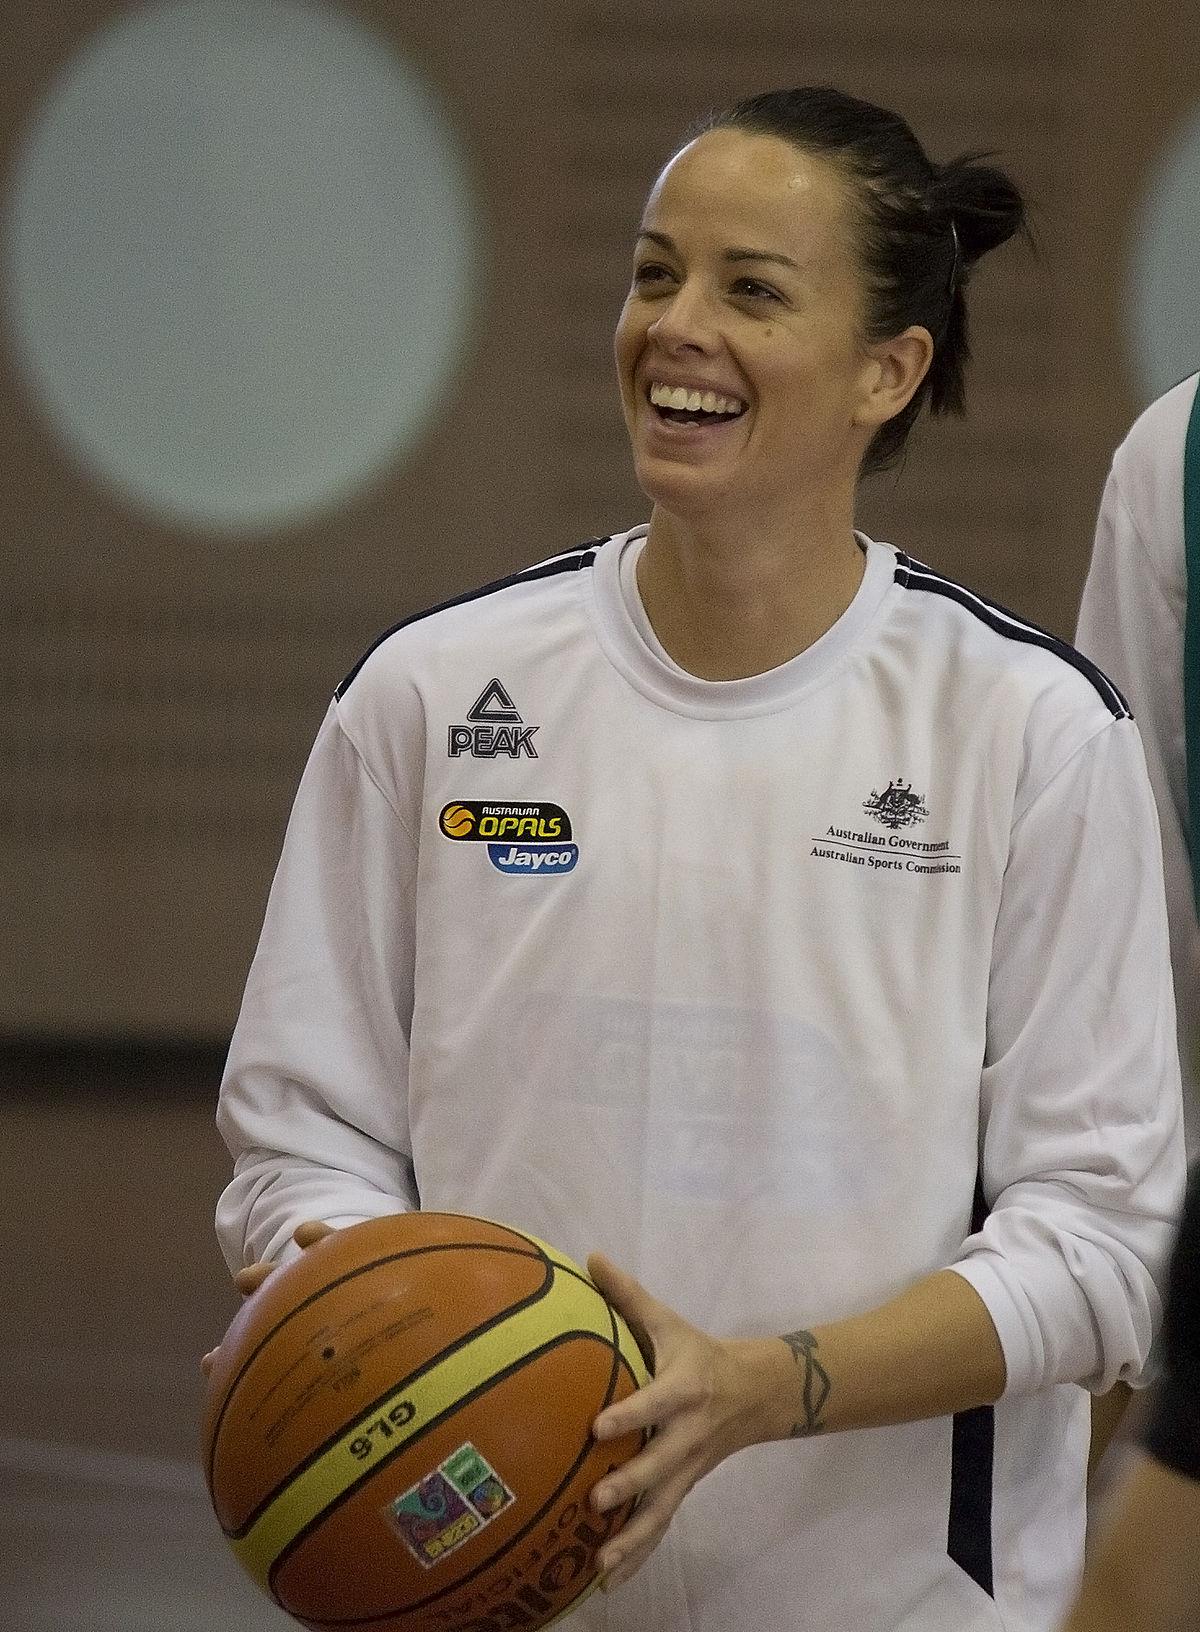 Kristen Veal - Wikipedia